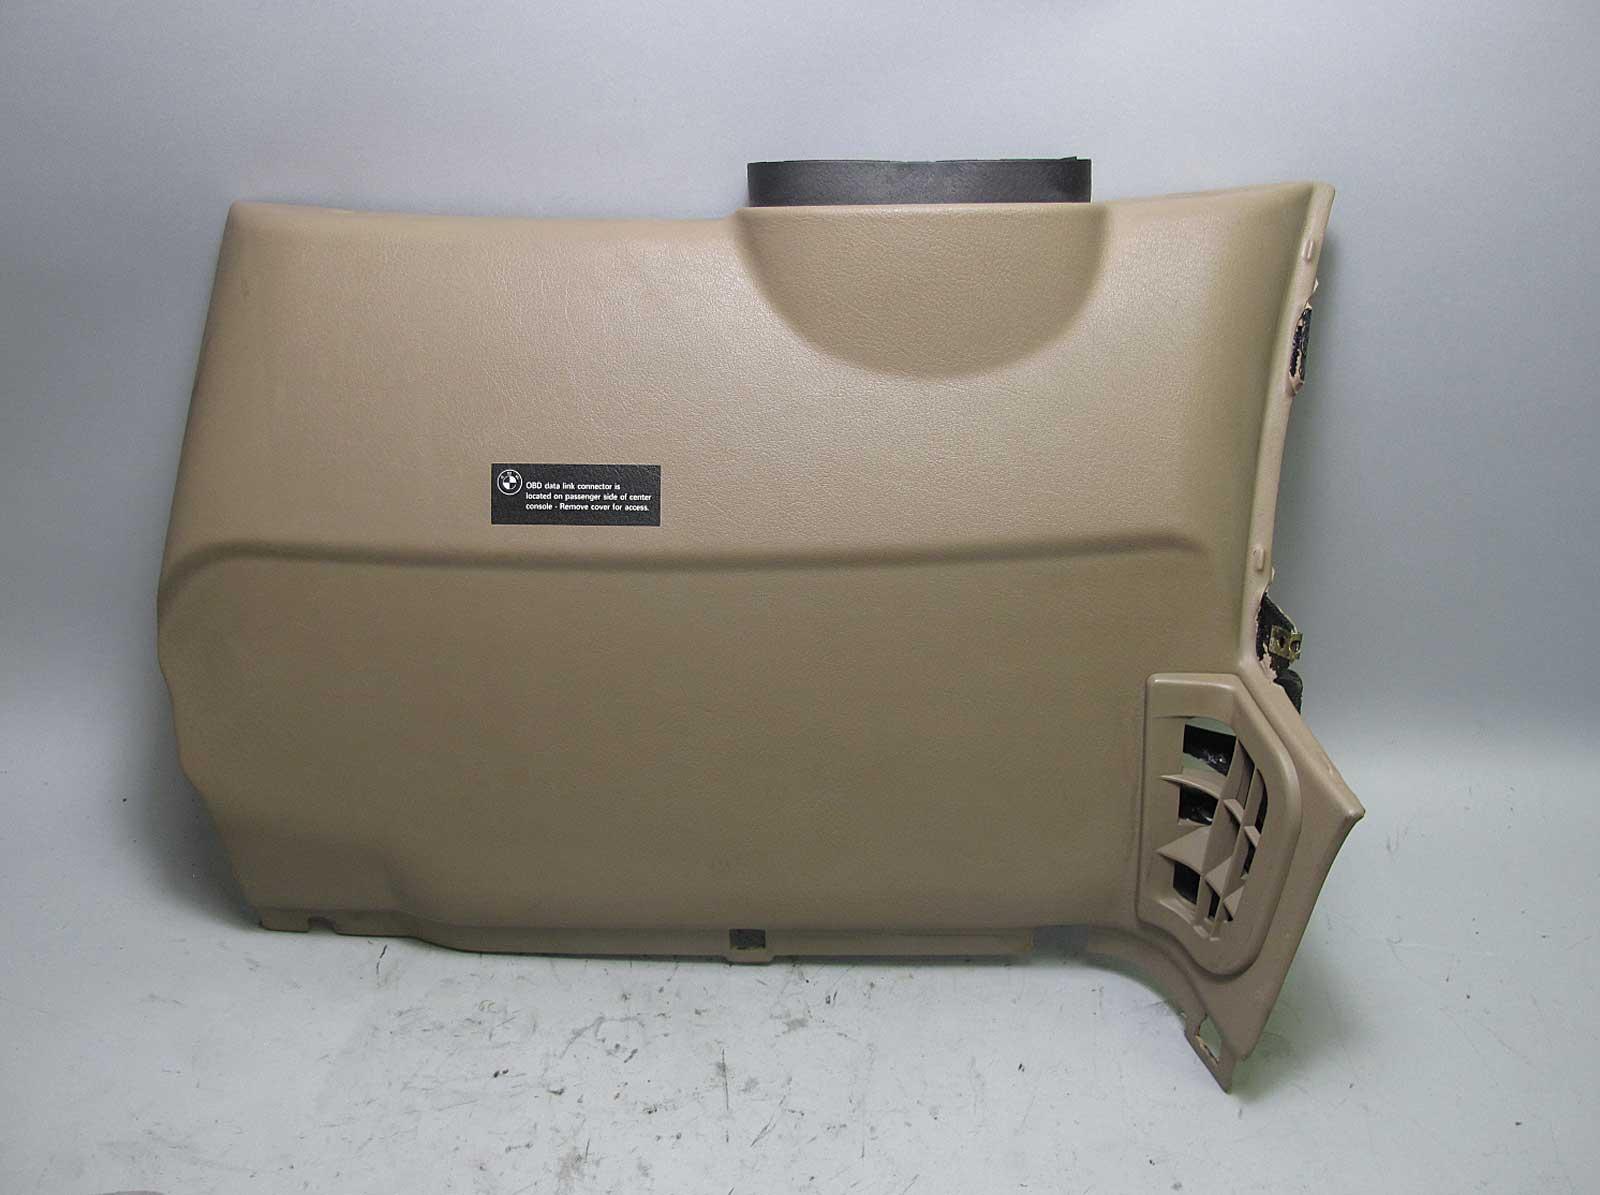 hight resolution of details about bmw z3 dashboard left drivers lower knee bolster trim panel beige 1996 2002 oem